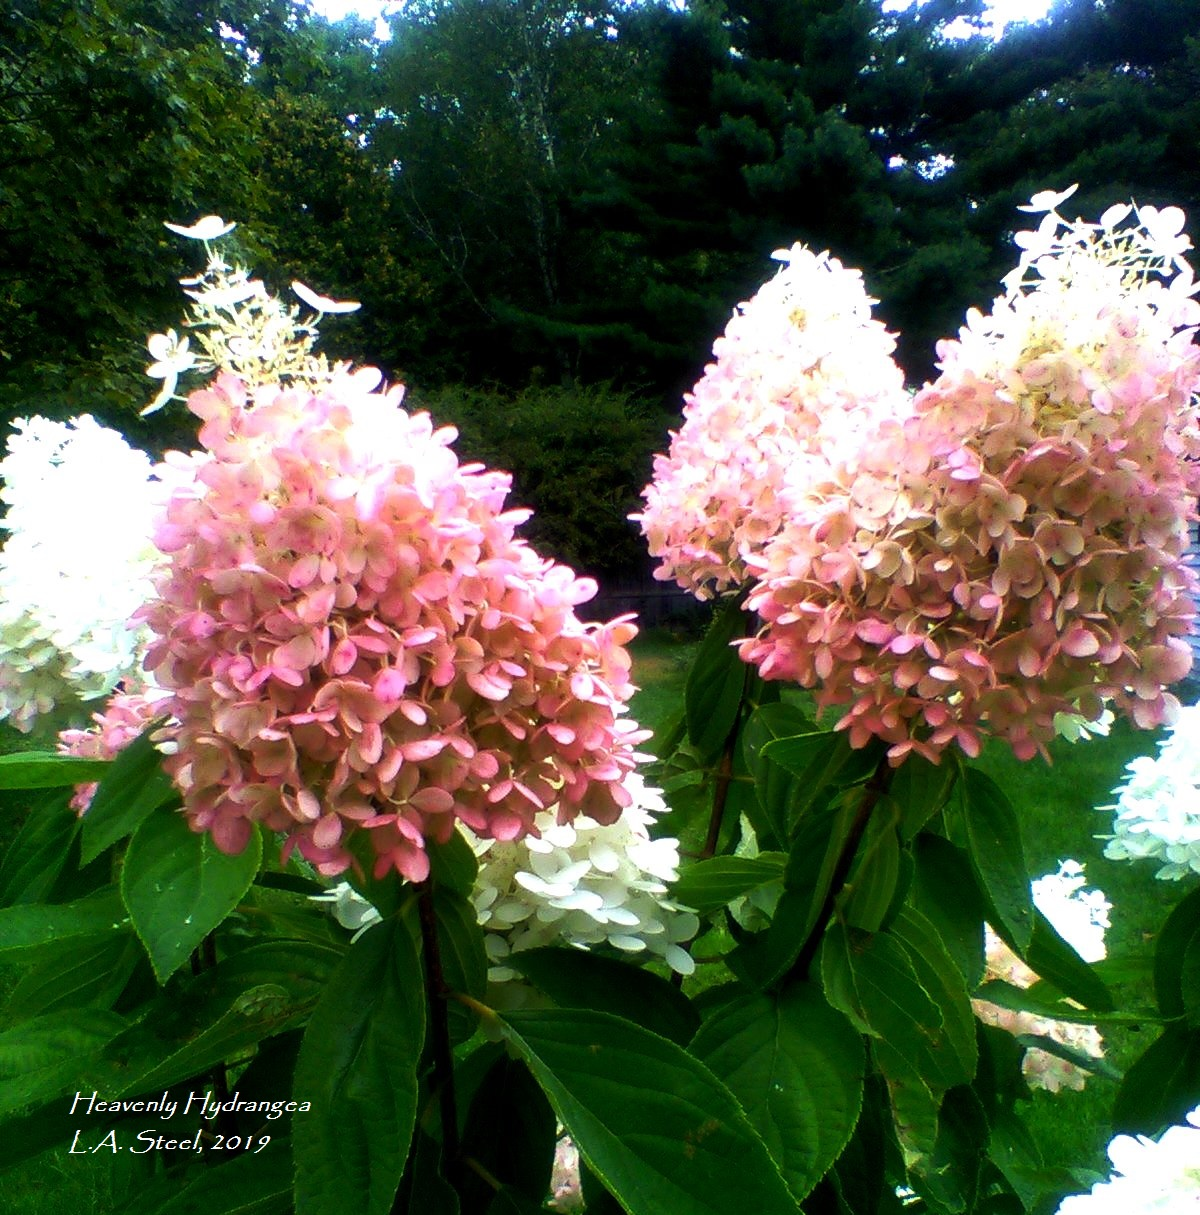 heavenly hydrangea 14 2019